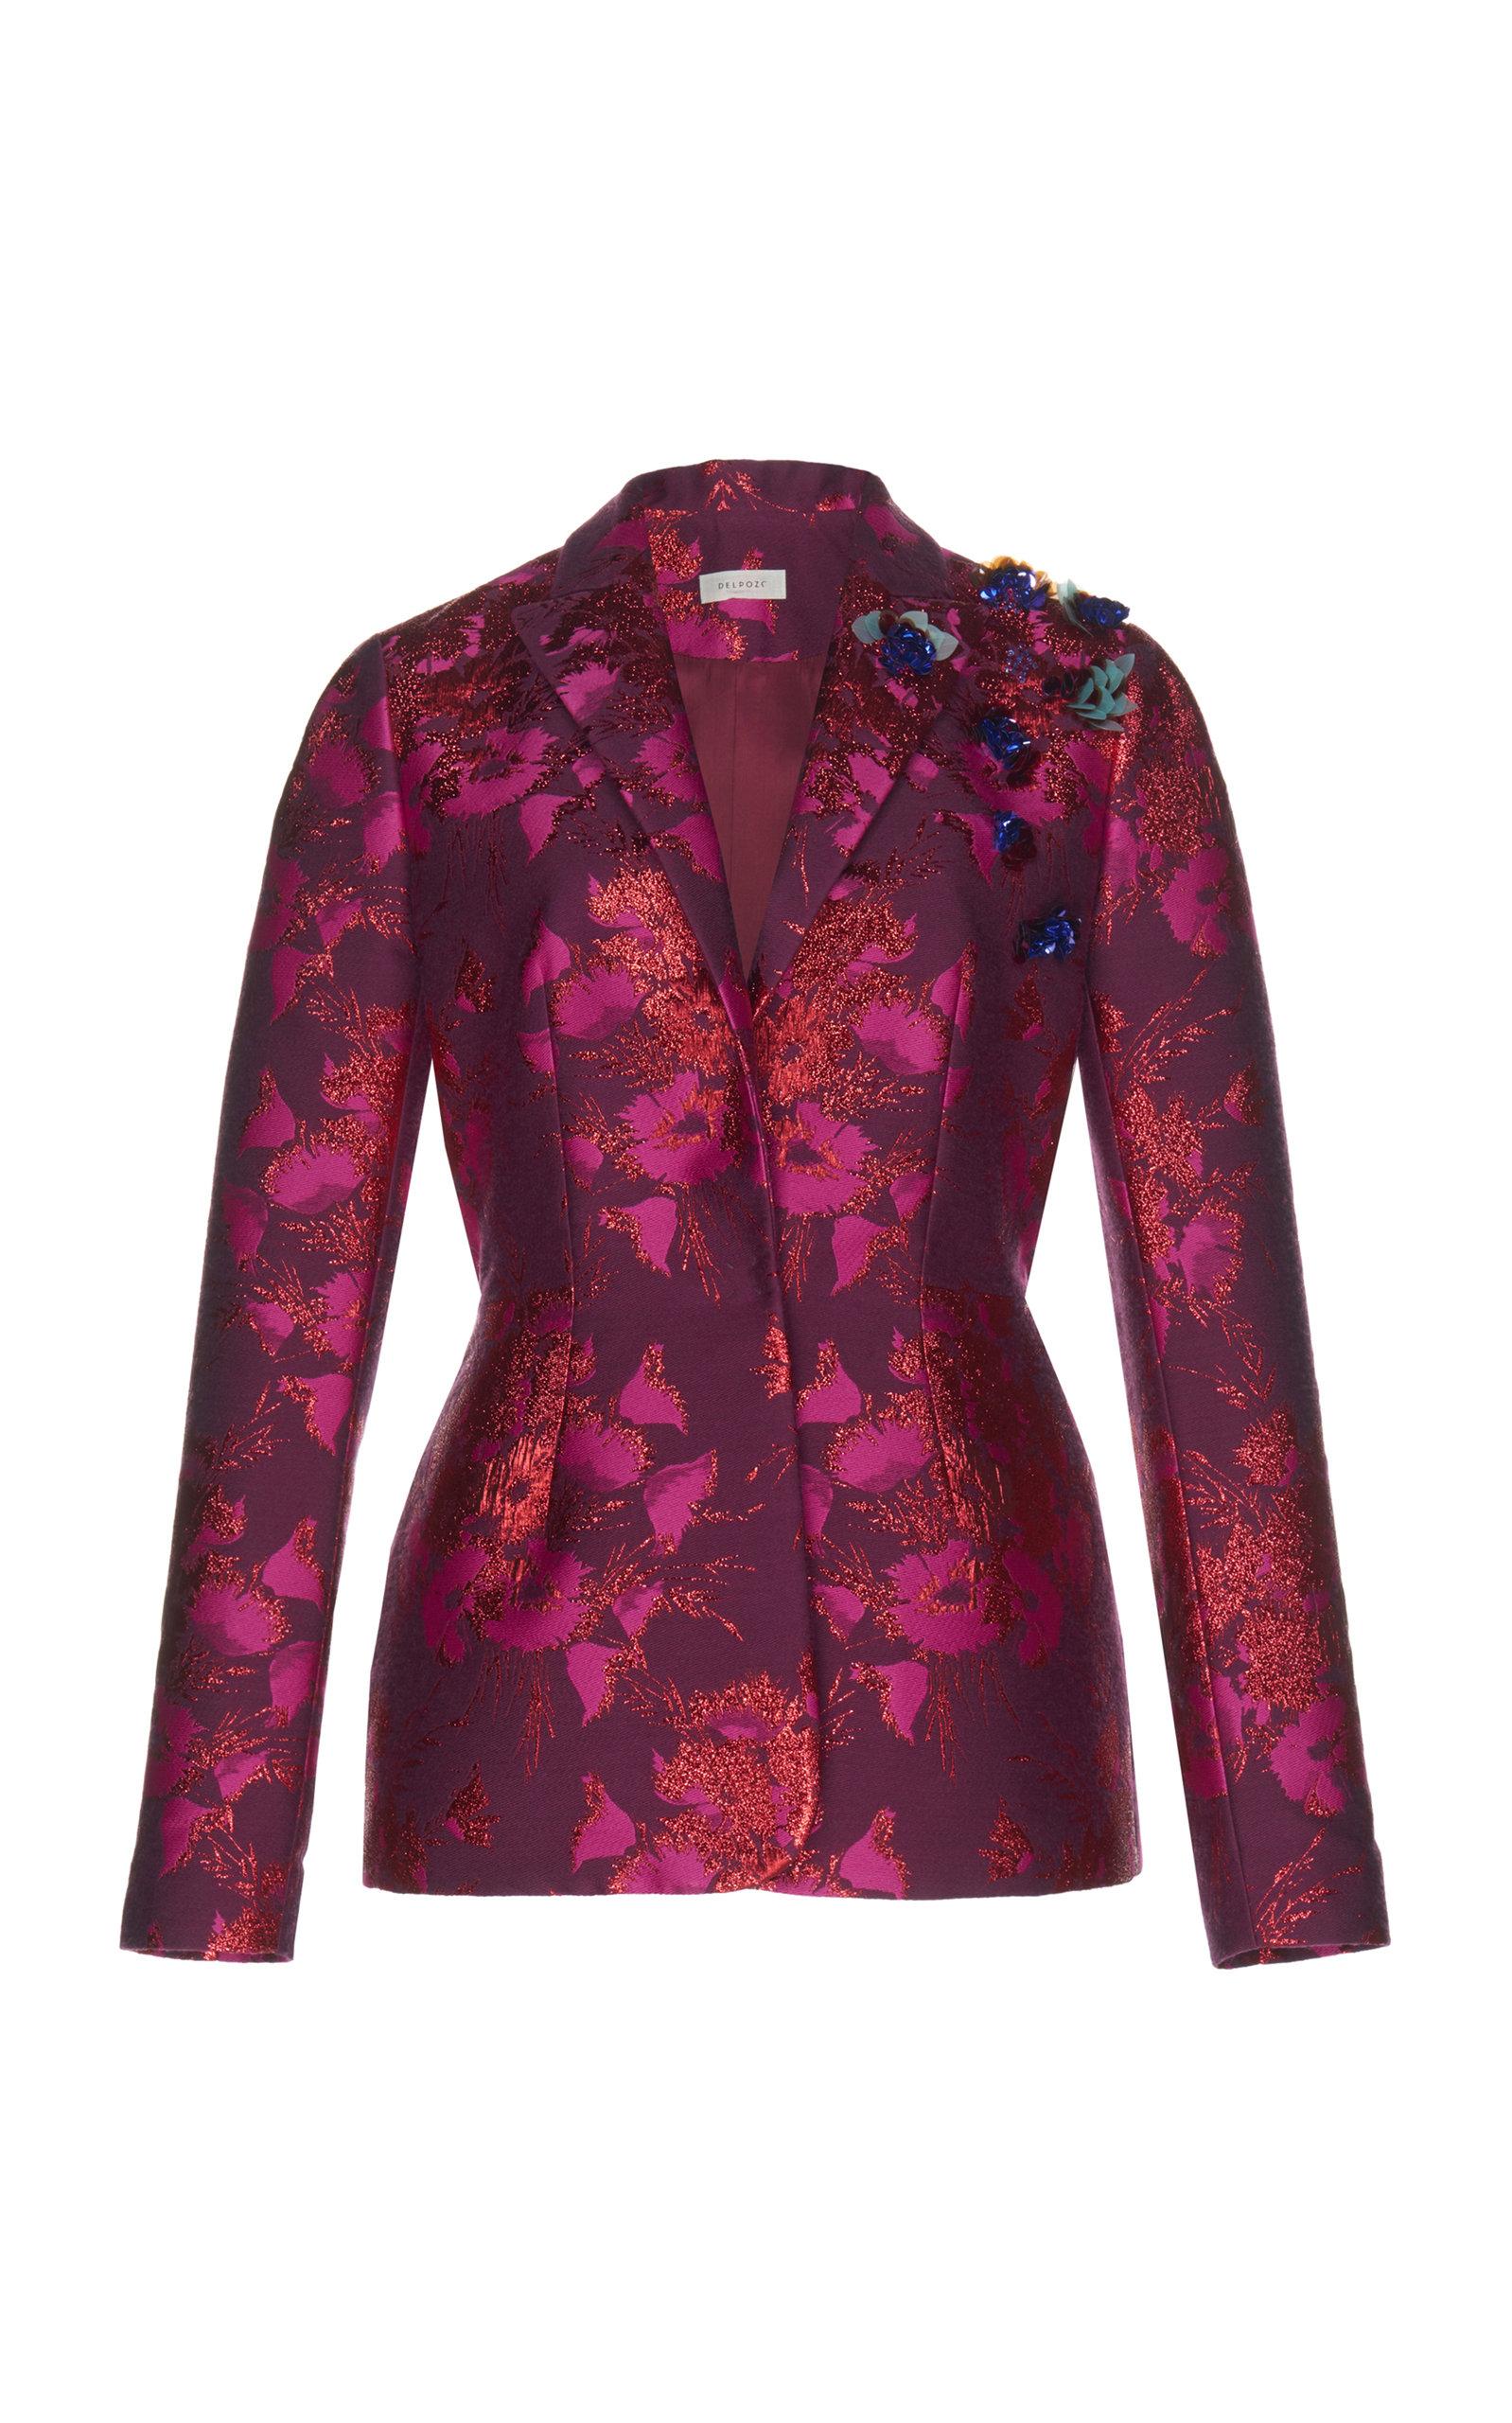 DELPOZO Floral Embroidered Blazer in Pink